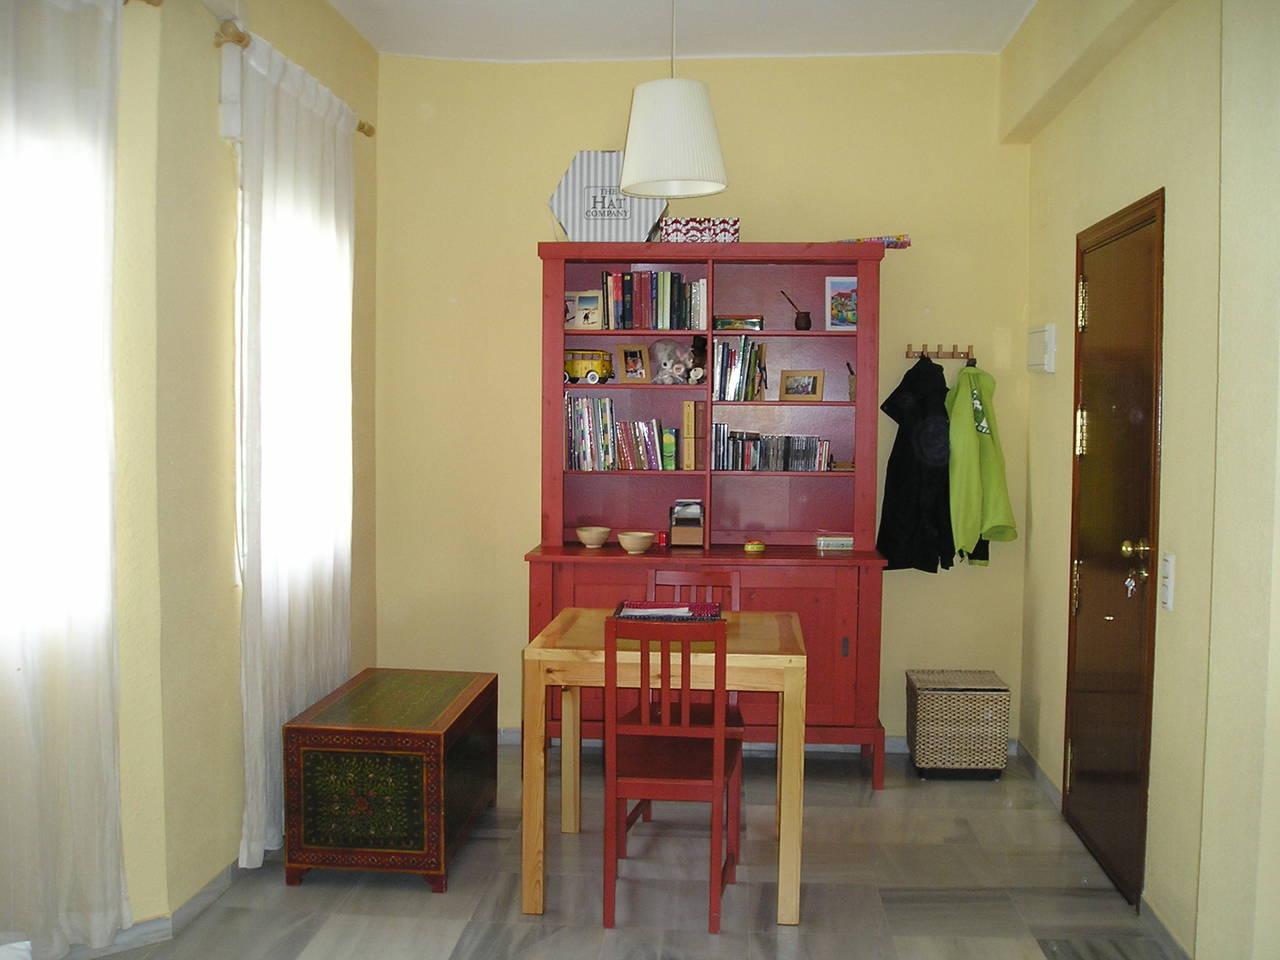 alquiler apartamento. Calle San Juan de Dios 17, 3º d. Sevilla  - Foto 3